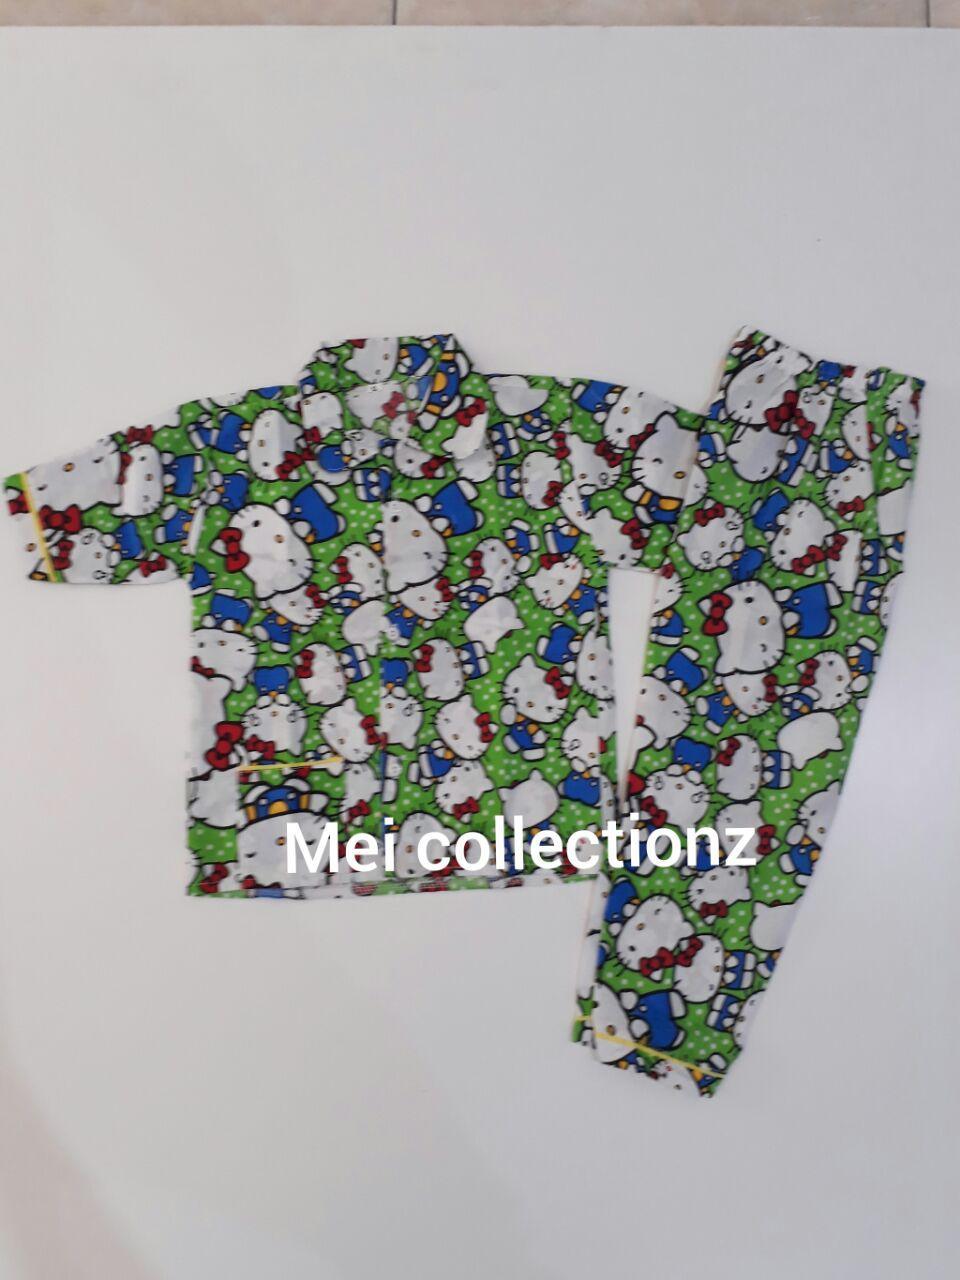 Mei Collectionz Piyama Anak Kitty Green Size XL / Piyama Anak Murah / Piyama Anak / Baju Tidur Anak / Baju Tidur / Baju Anak Murah / Katun Catra / Katun Korea / Katun CVC